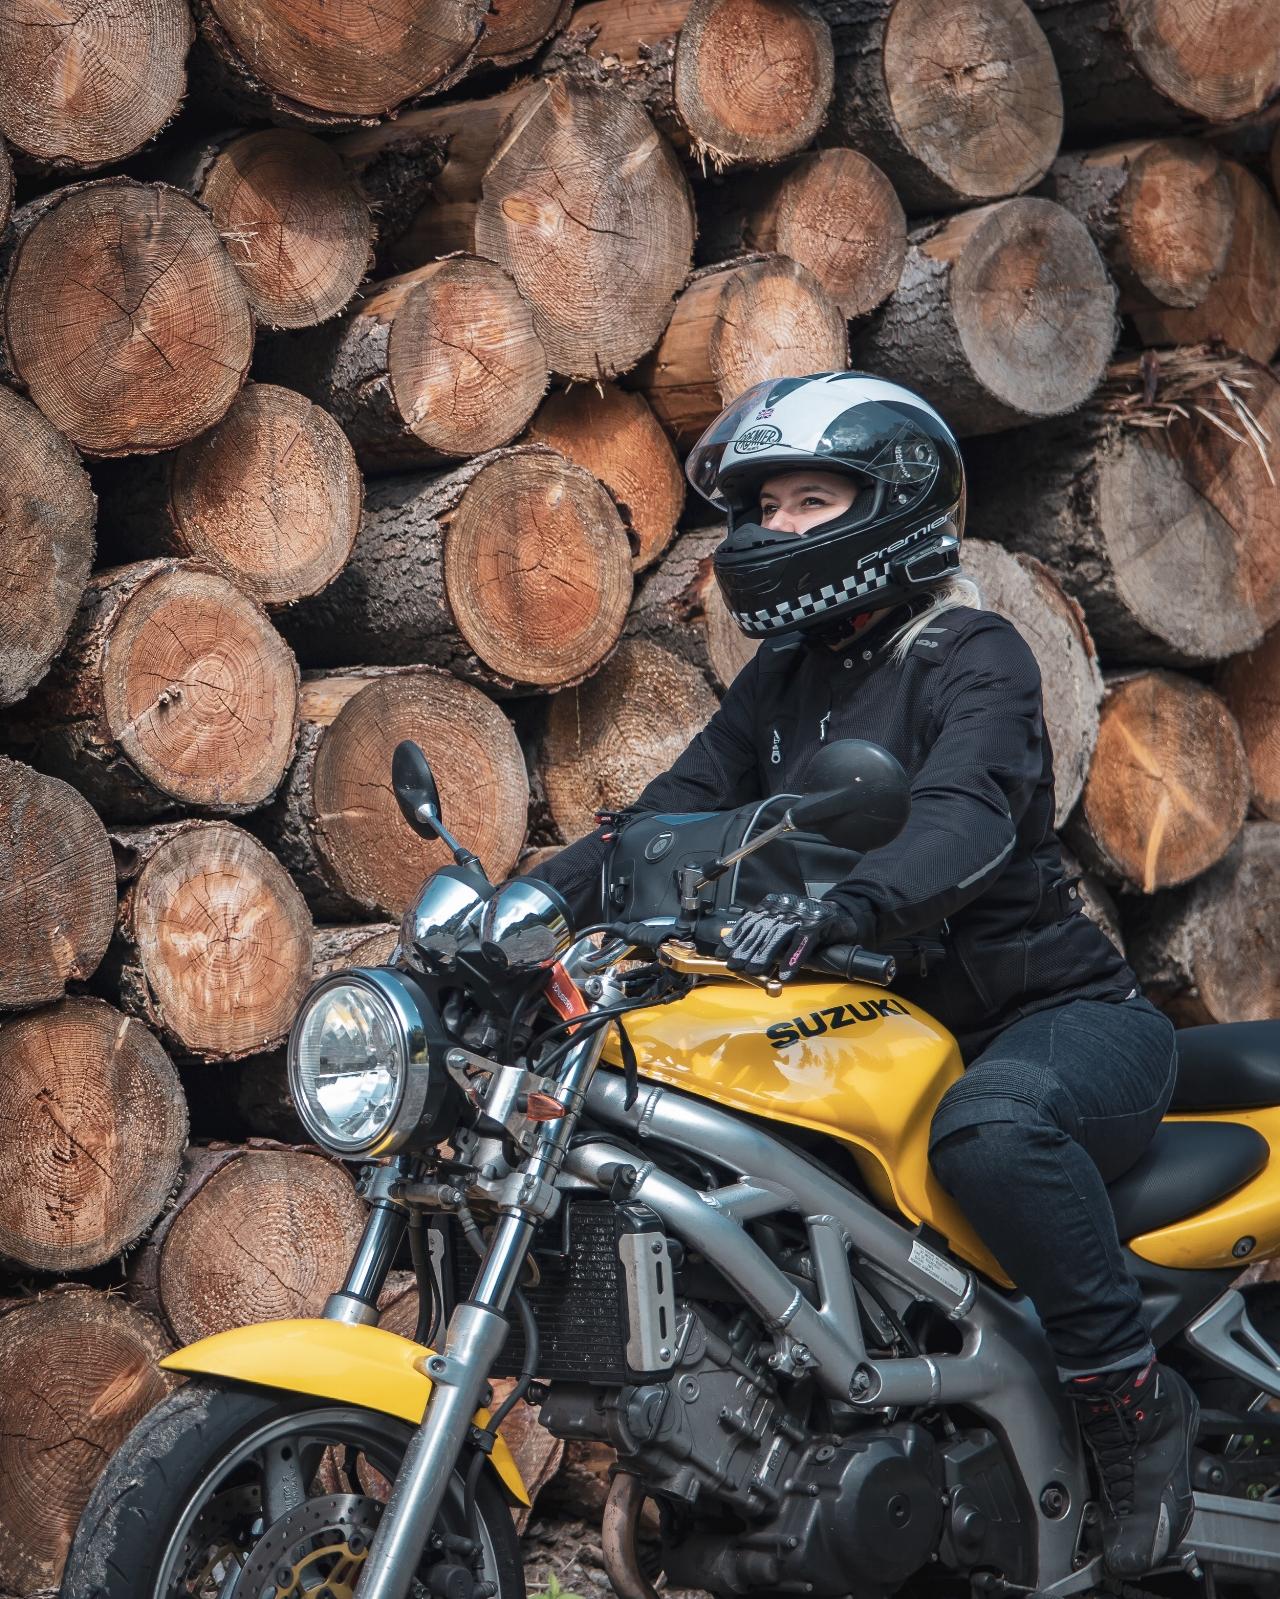 Biker woman on yellow suzuki sv 650